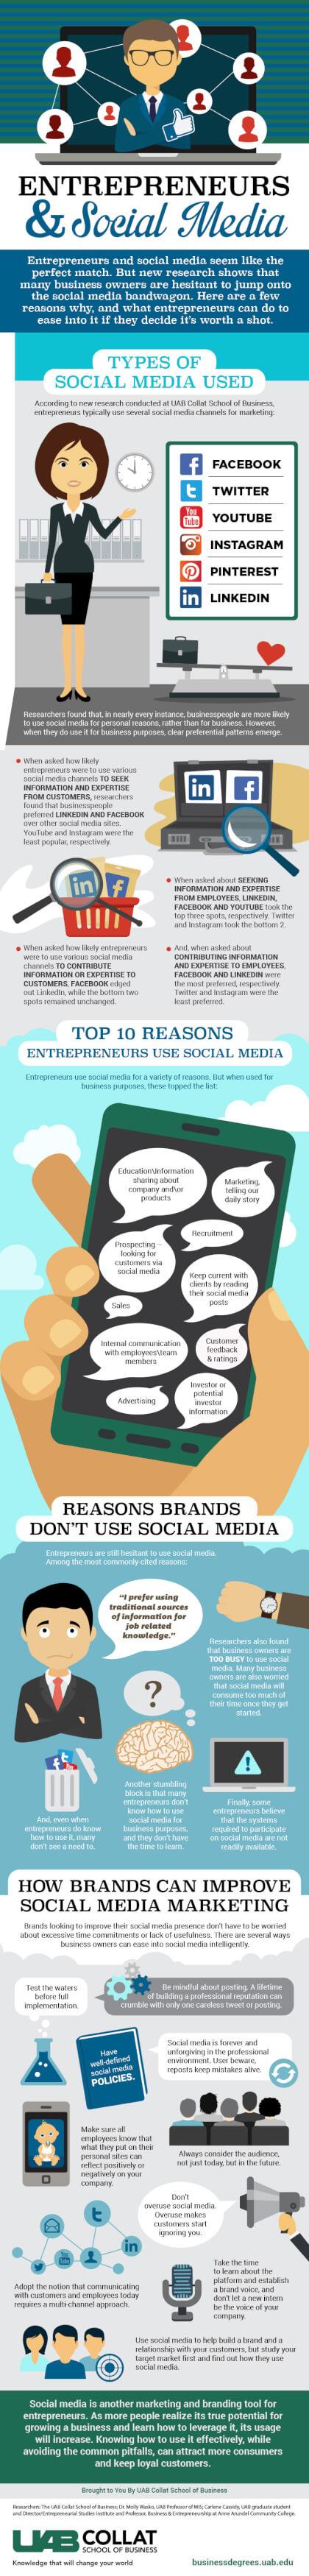 Entrepreneurs and Social Media-infographic